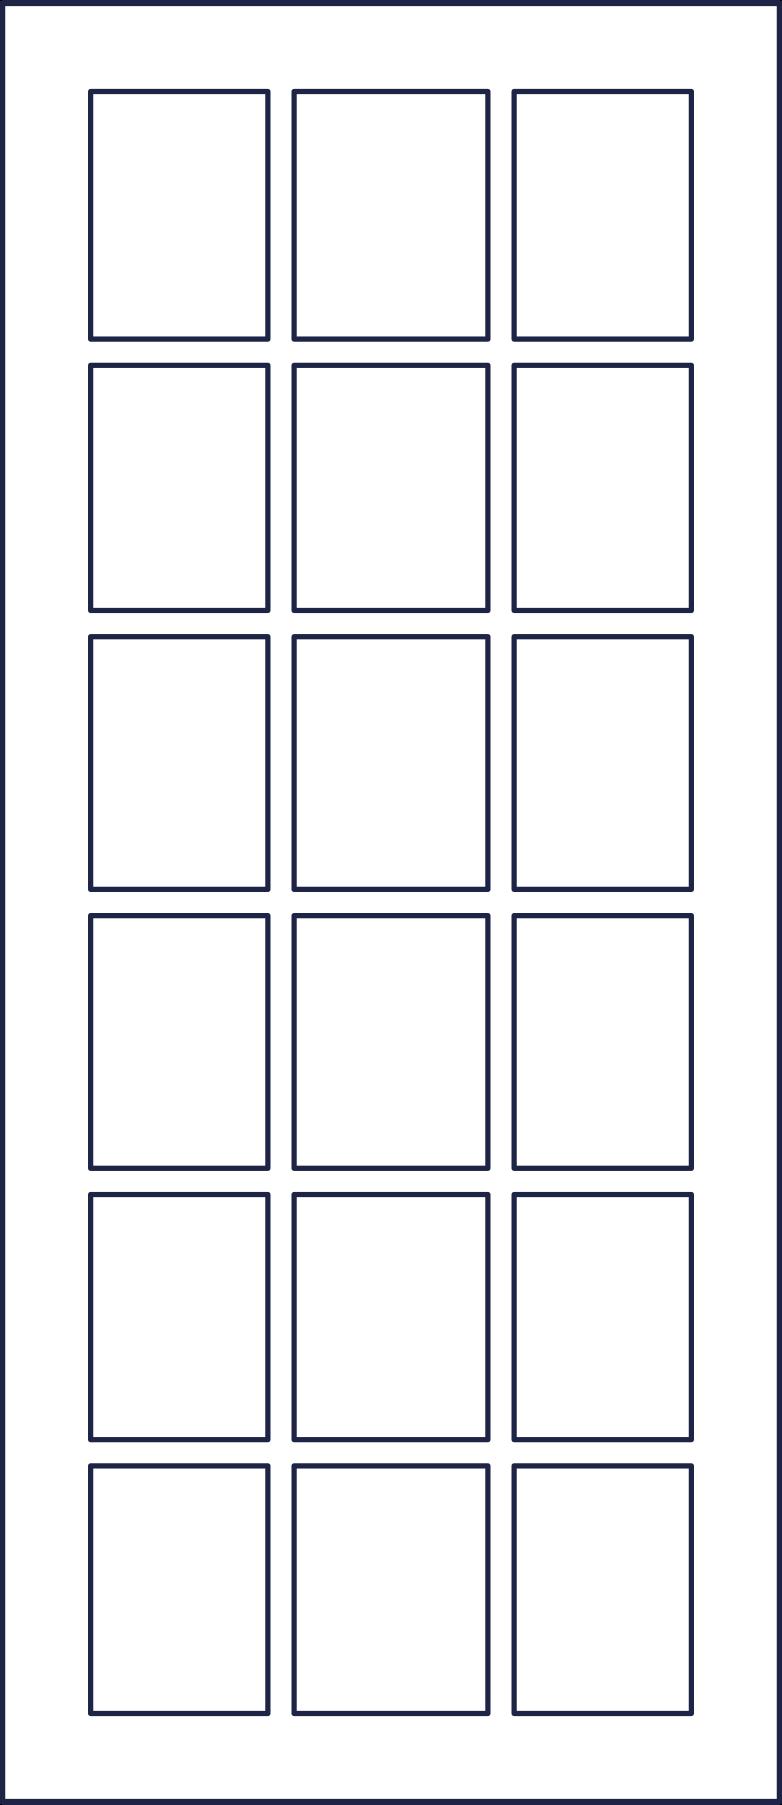 welcome  door 1 line Clipart illustration in PNG, SVG